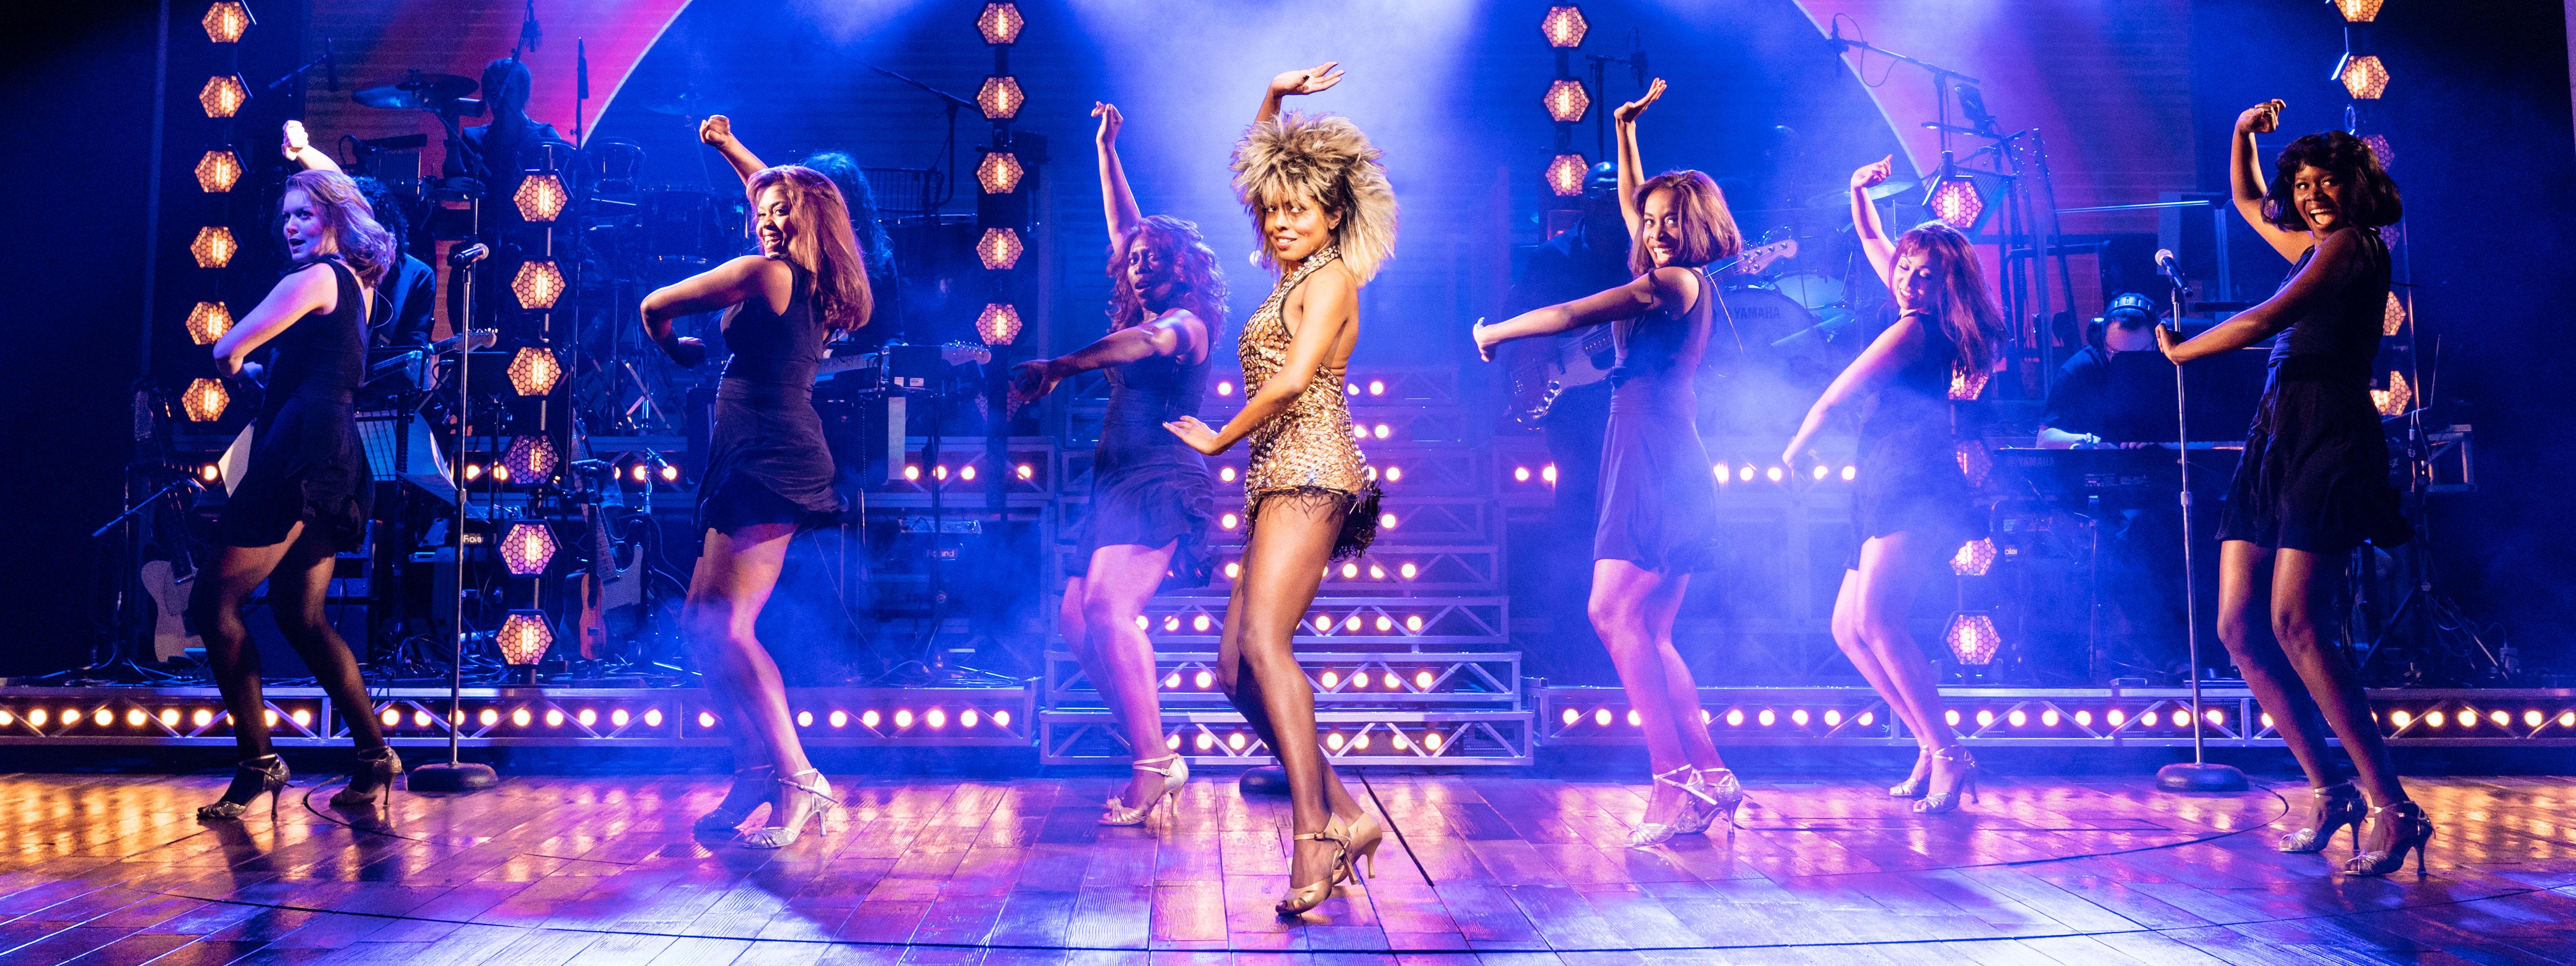 Tina Turner stage show